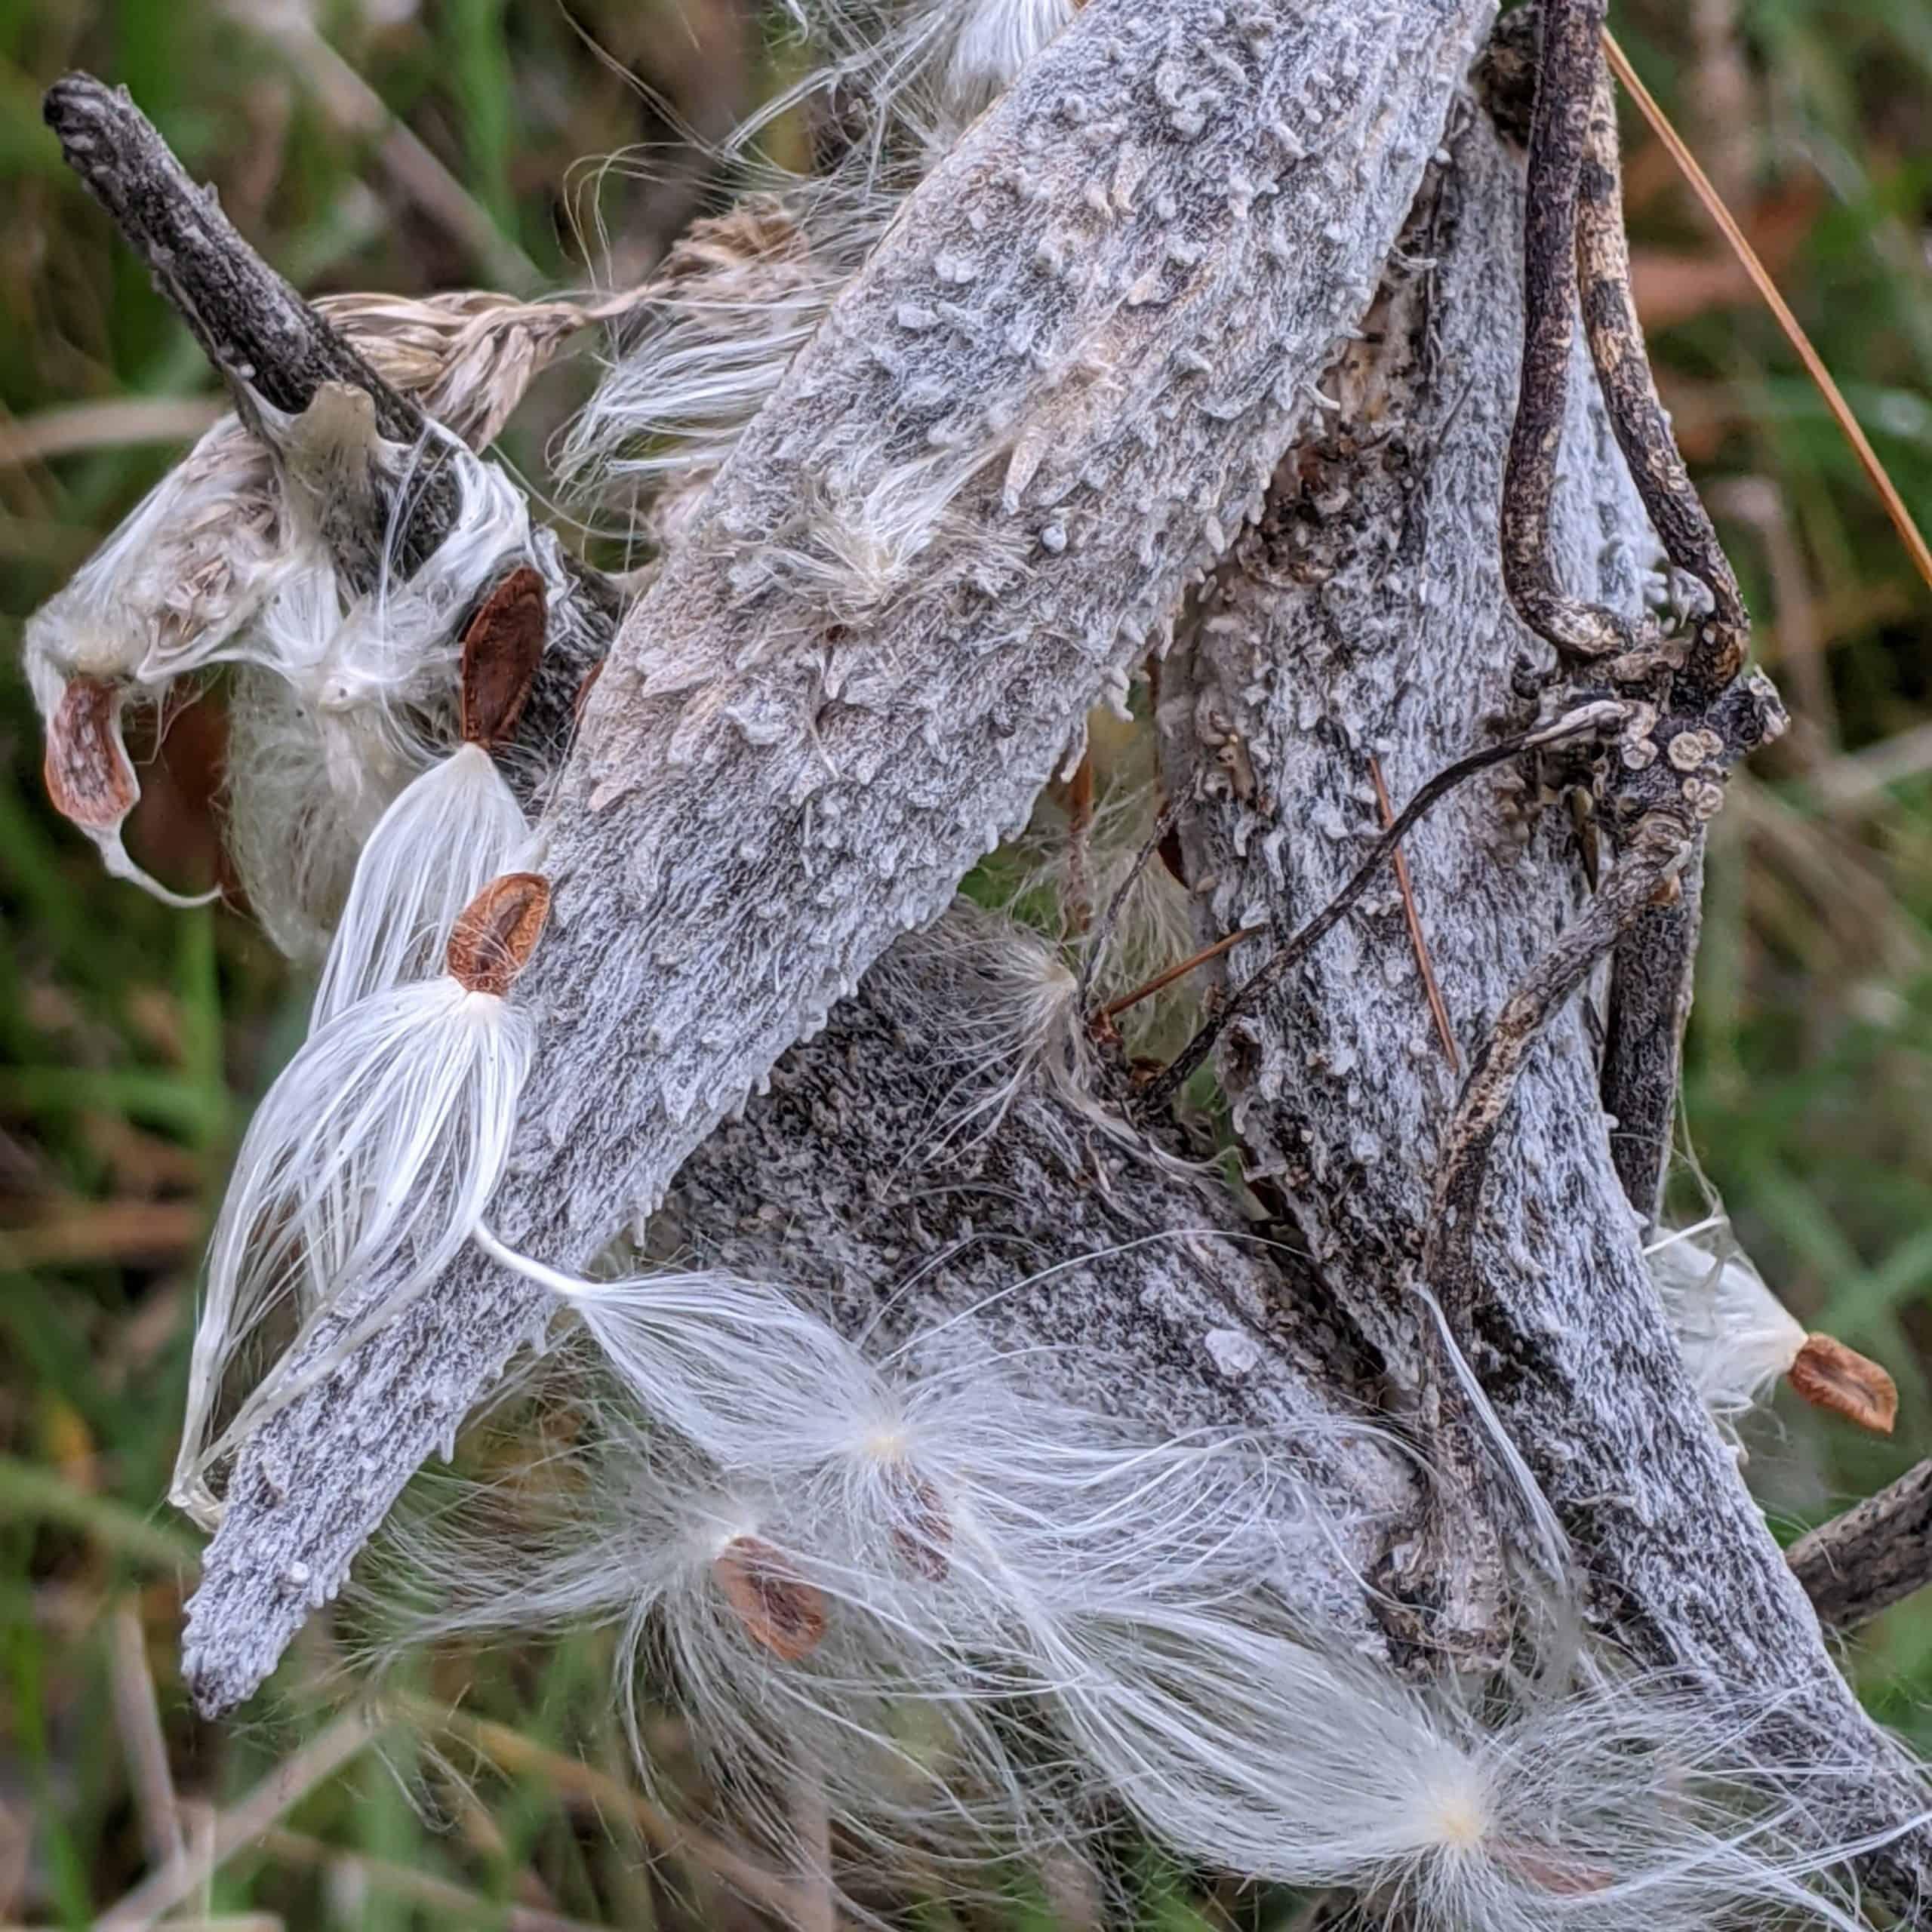 milkweed pods and angel wings